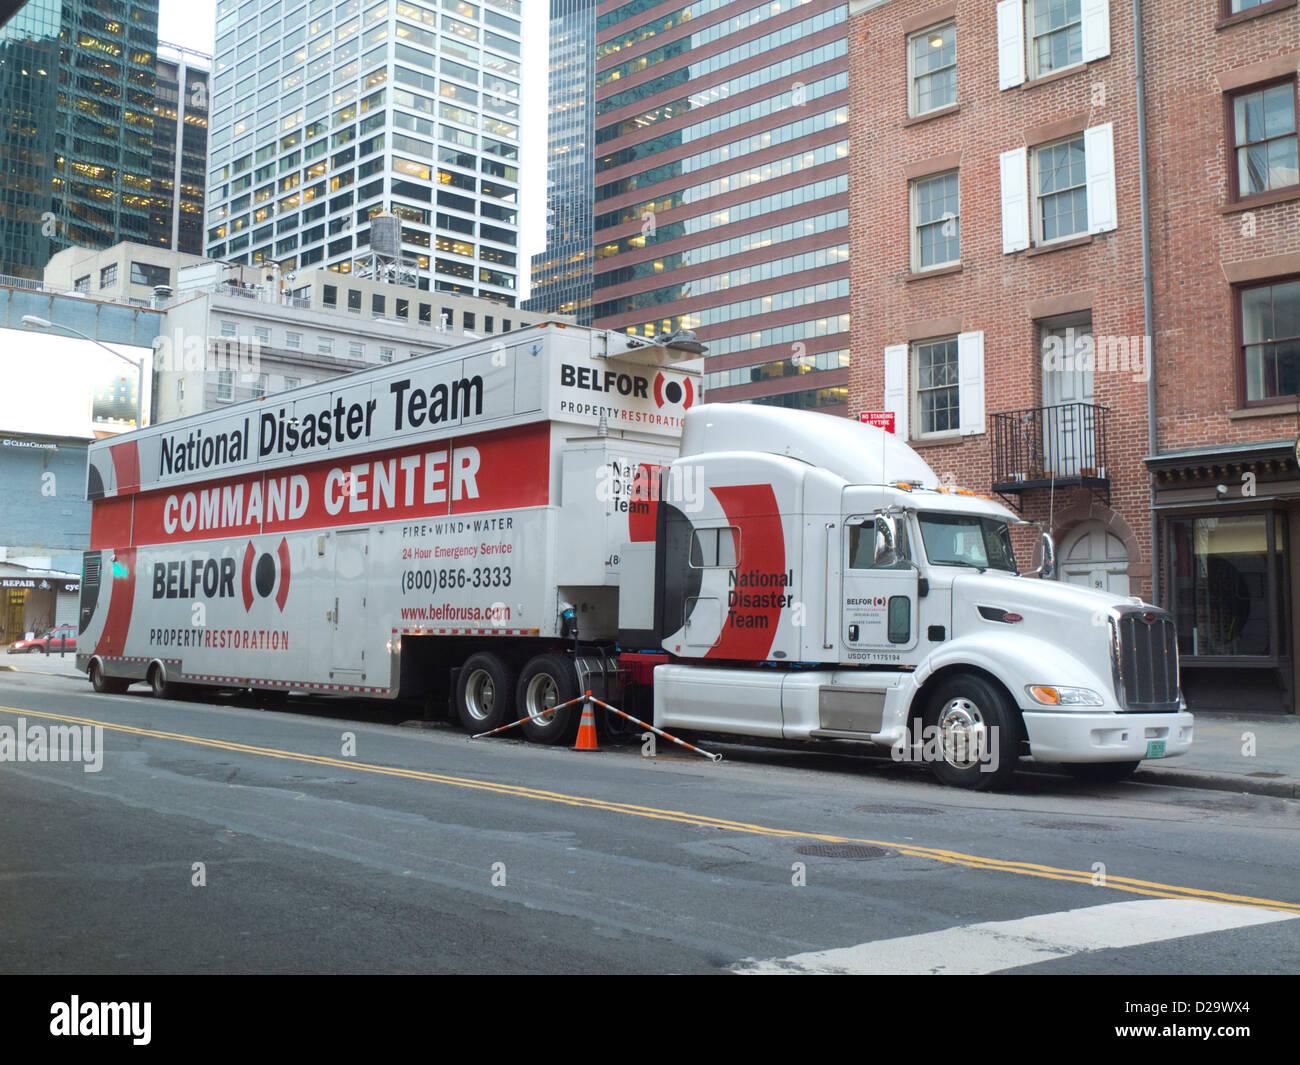 National Disaster Team truck command center - Stock Image